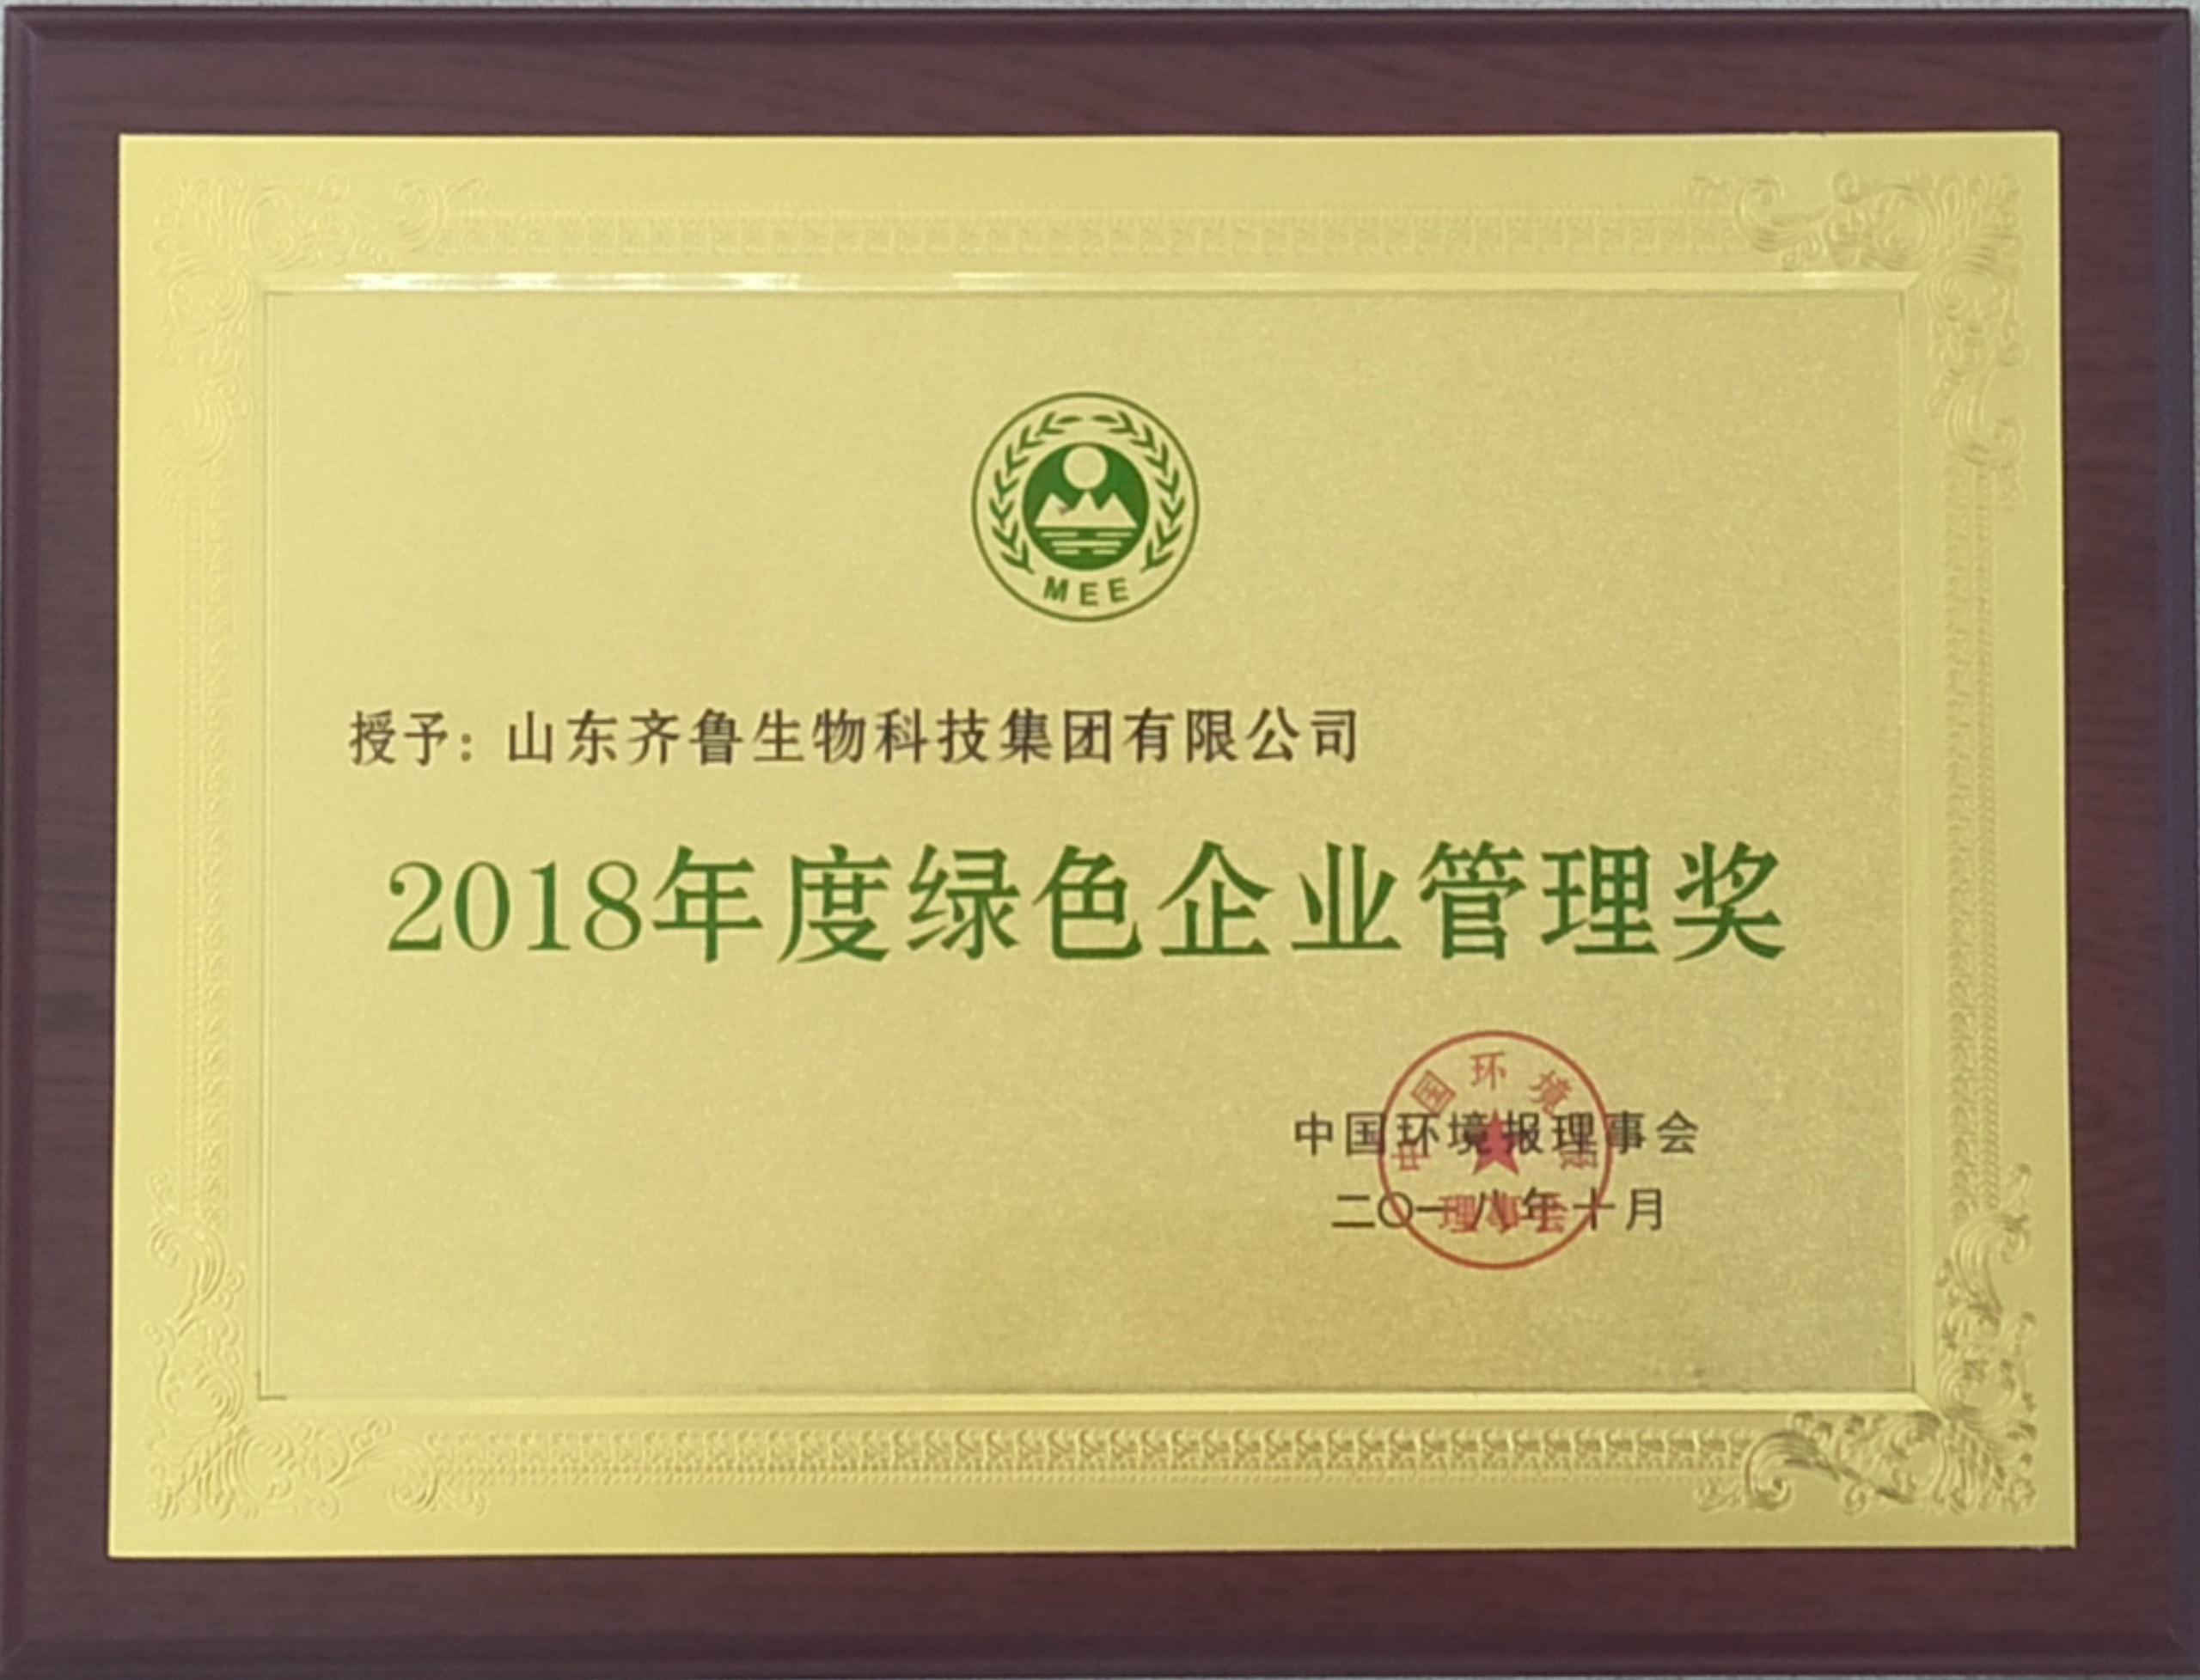 2018 Green Enterprise Management Award